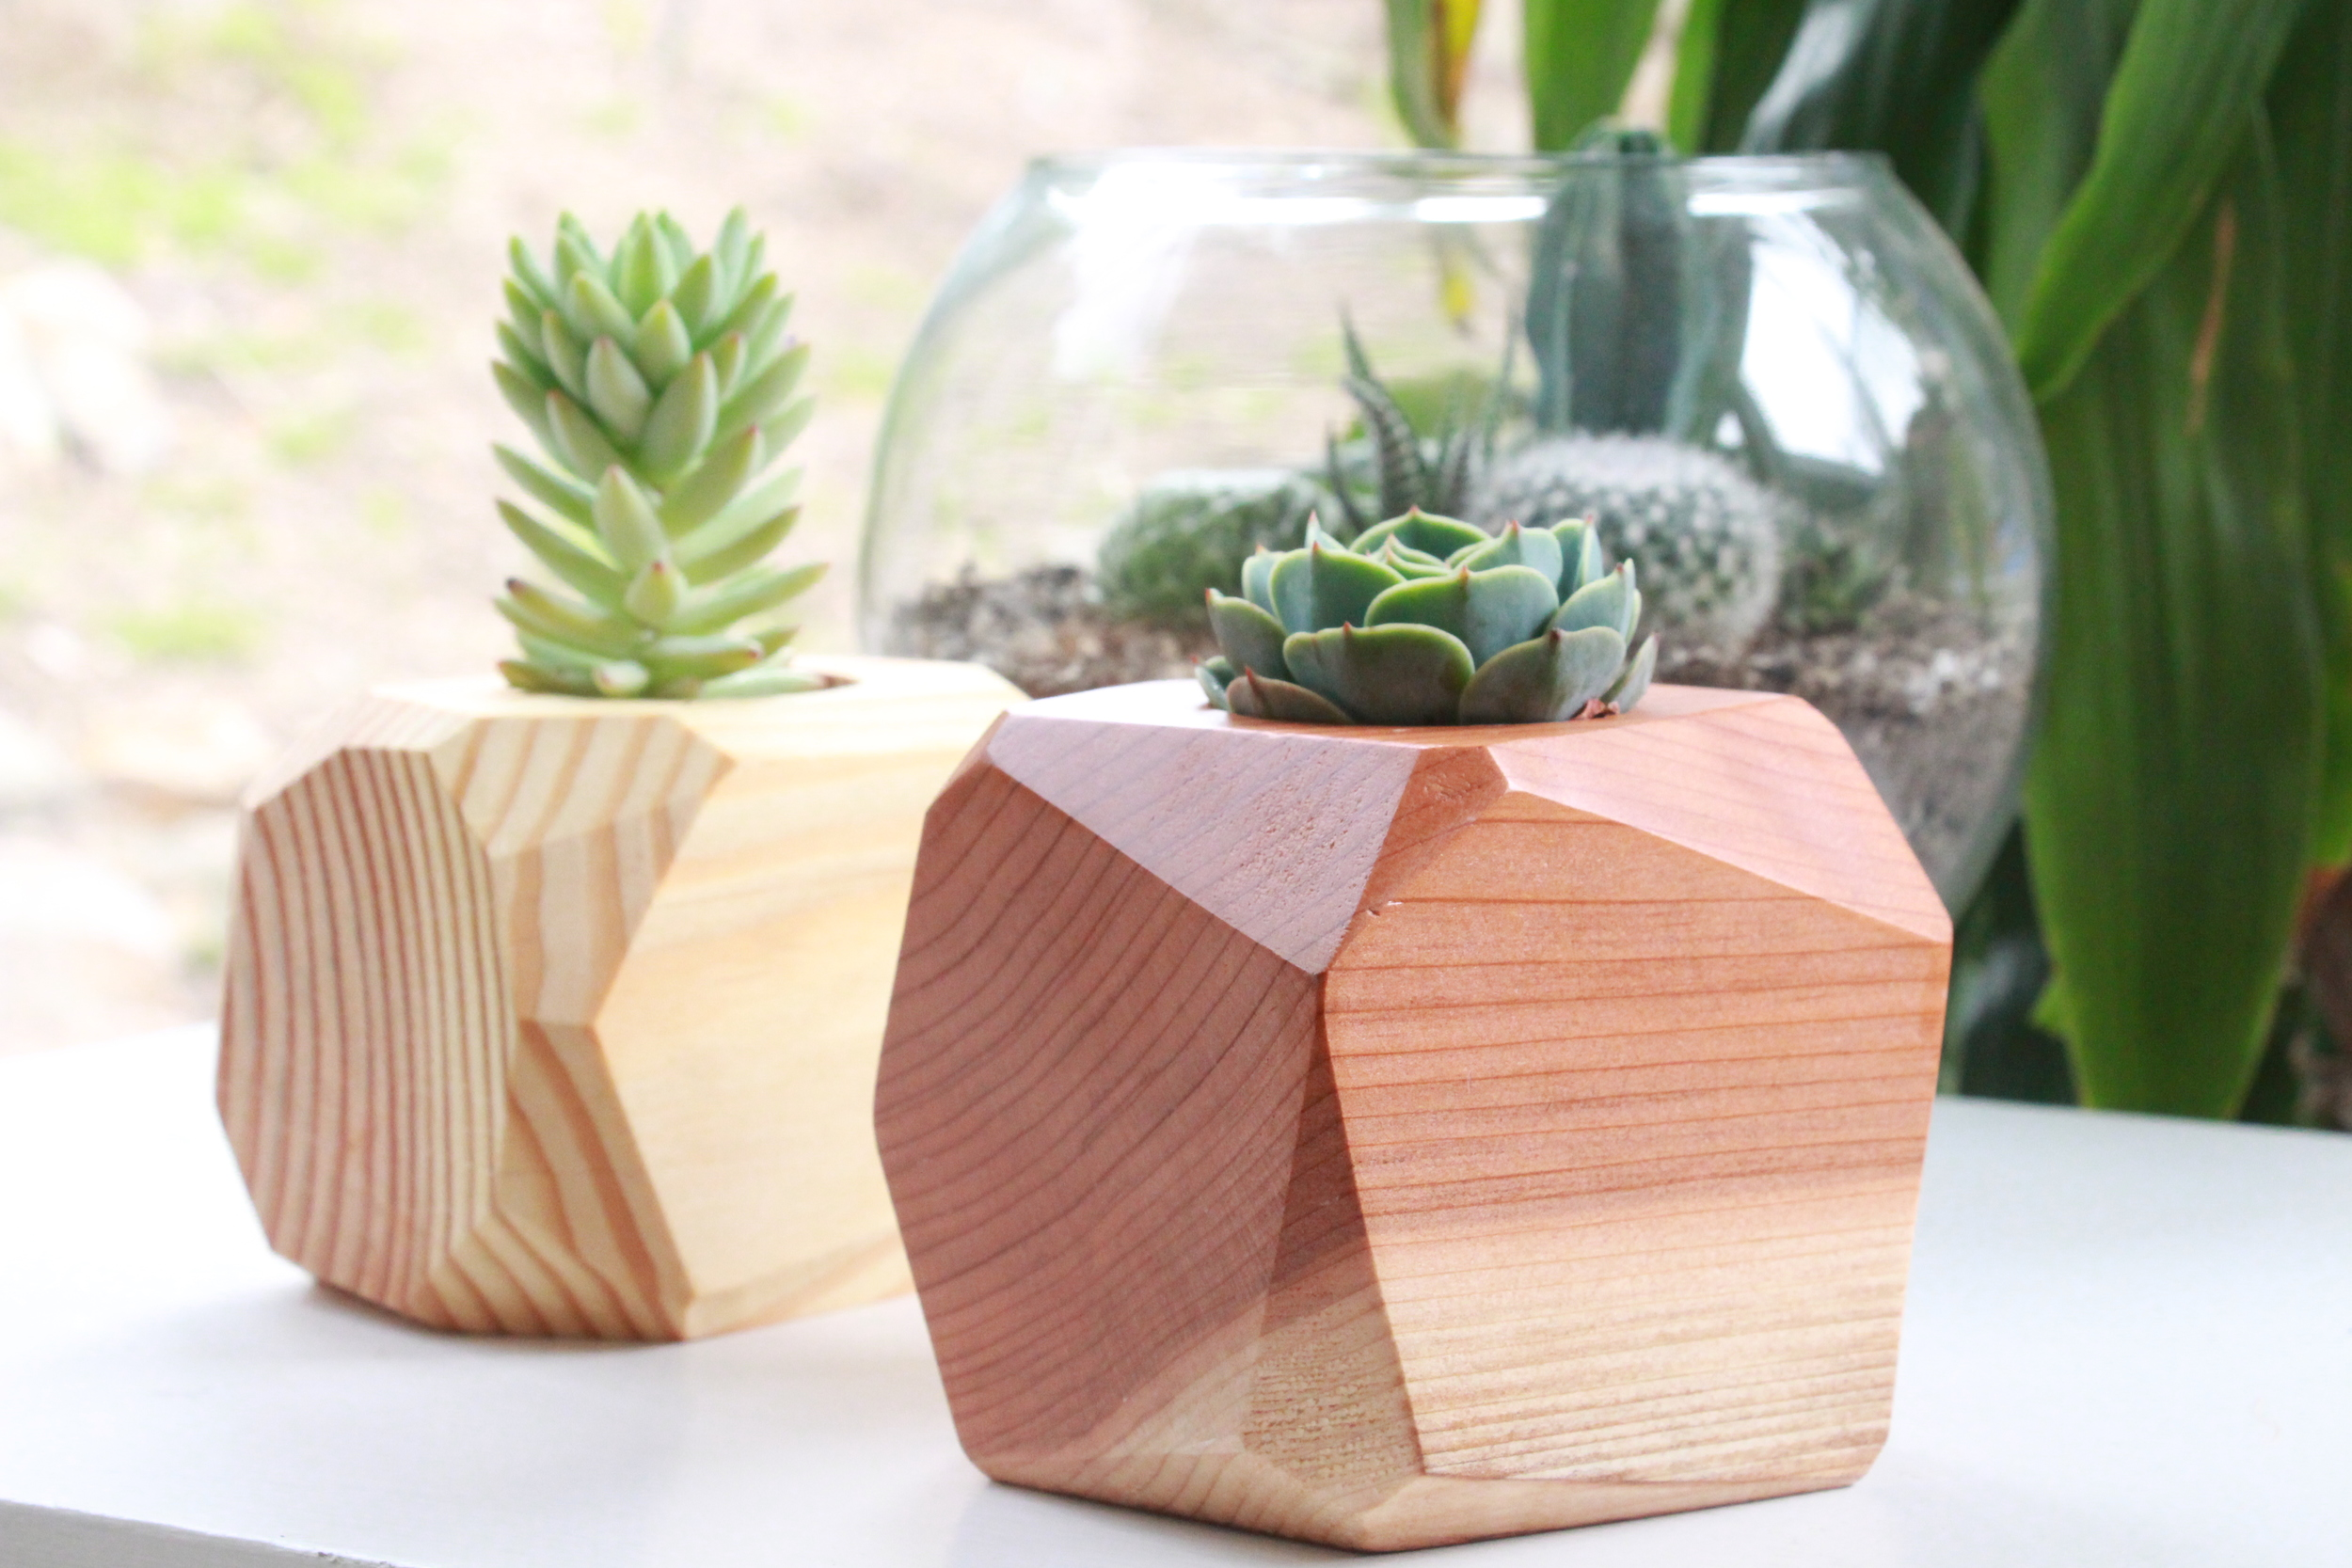 geometric-wood-succulent-planter-kinsfolk-accessories-needlesandleaves_net.jpg